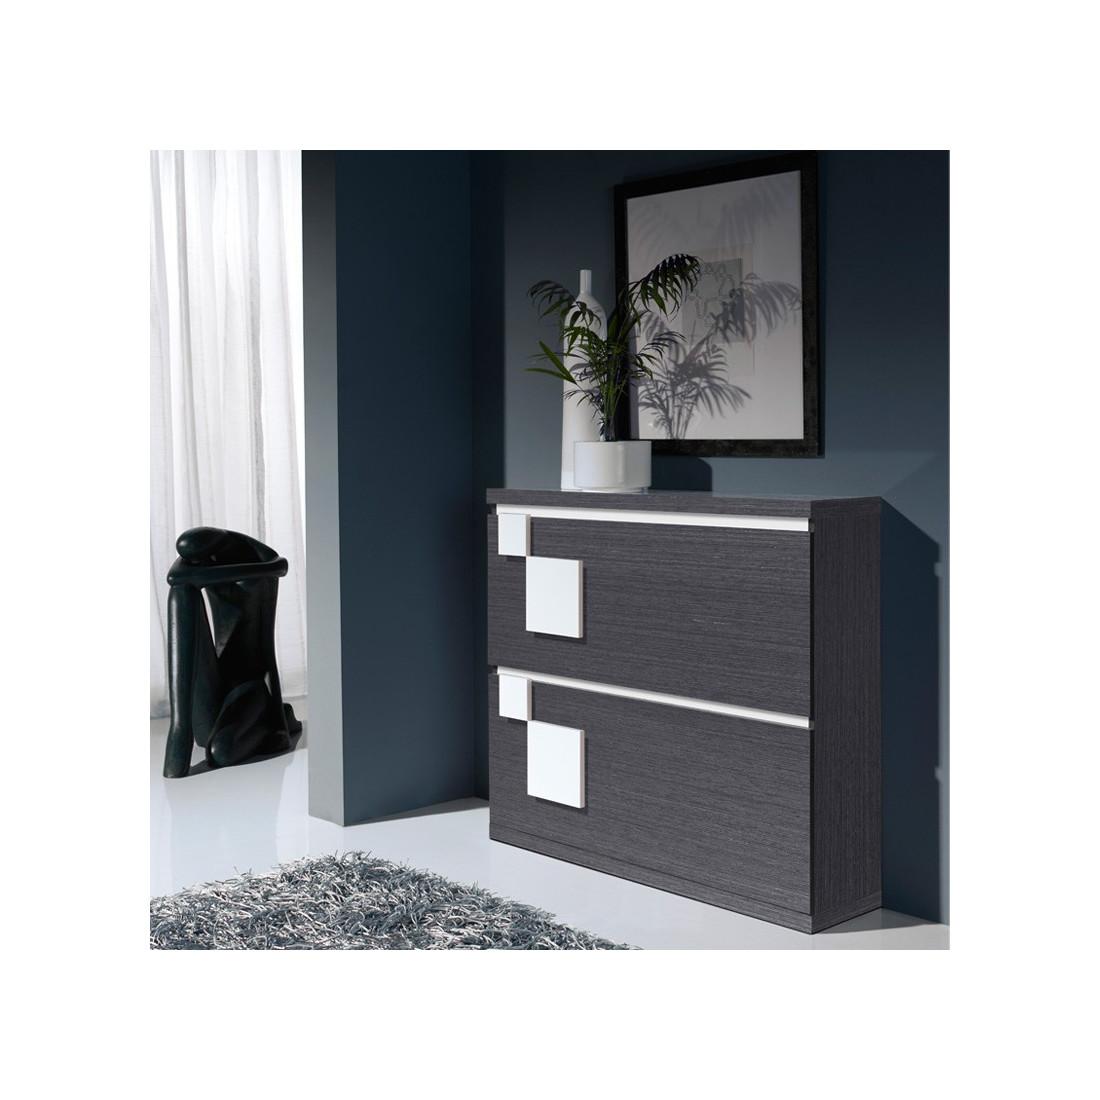 meuble chaussures cendre blanc squadra univers petits meubles. Black Bedroom Furniture Sets. Home Design Ideas